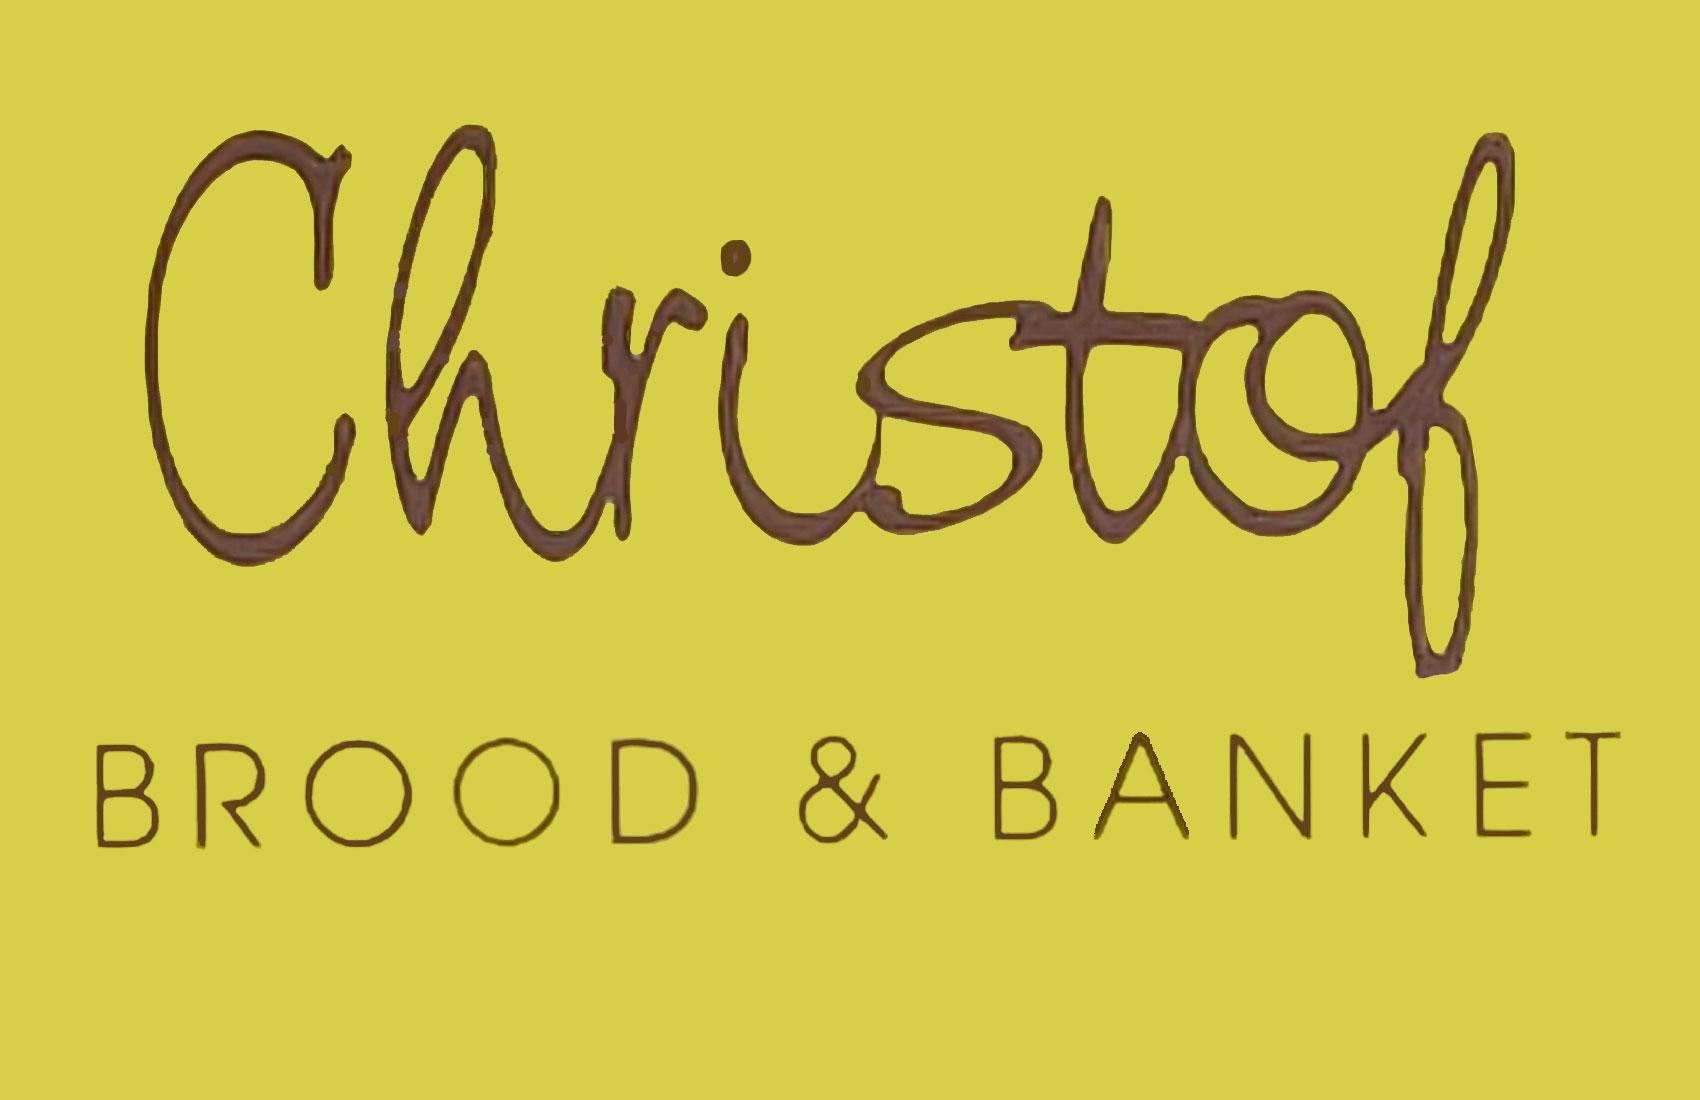 Brood & banket Christof